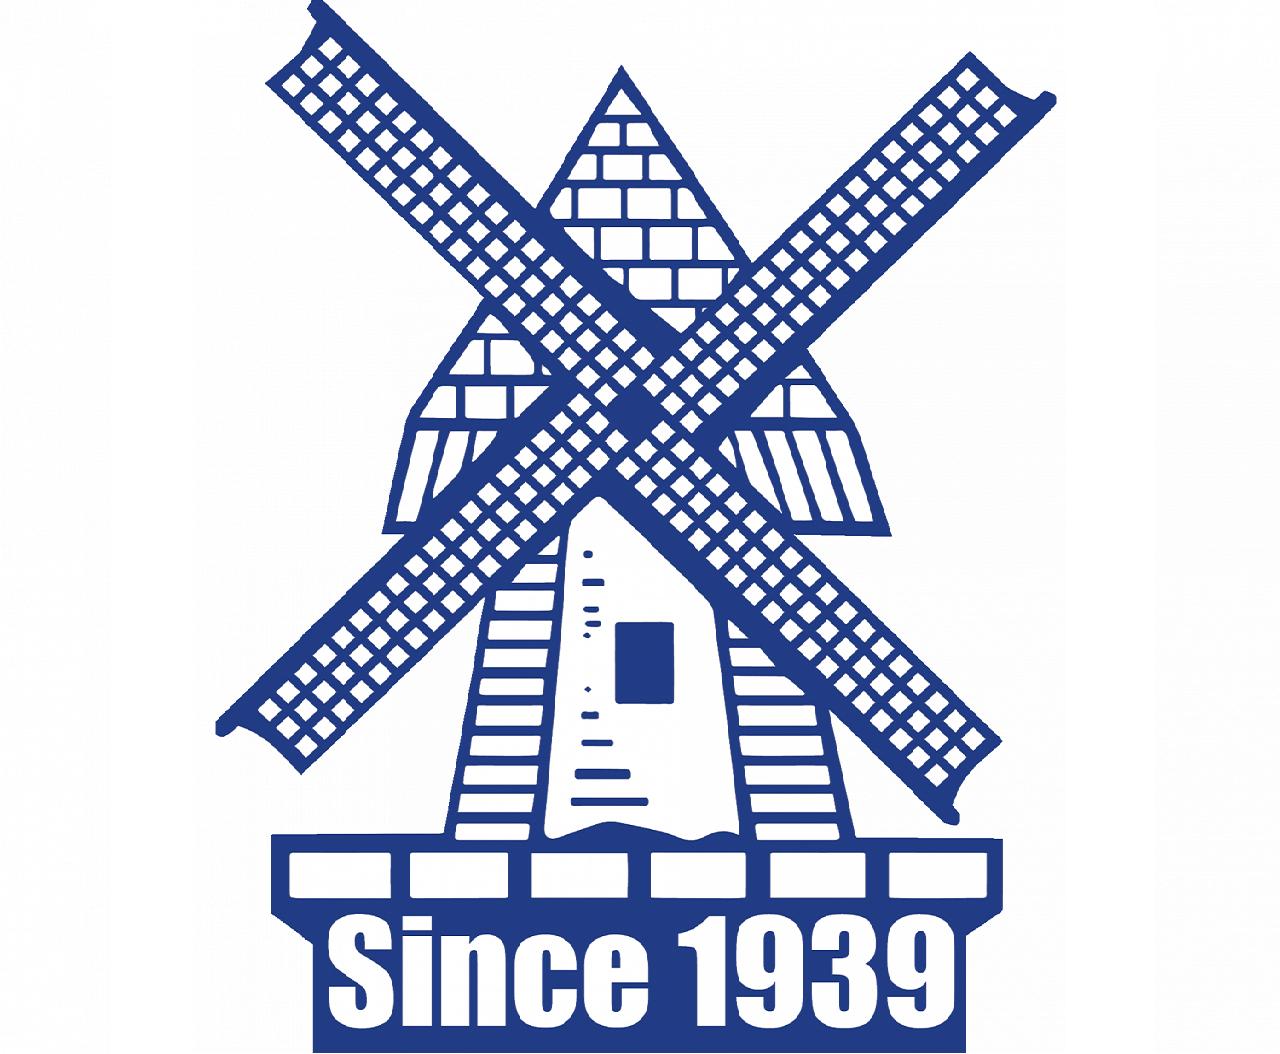 fuse box [ 1280 x 960 Pixel ]